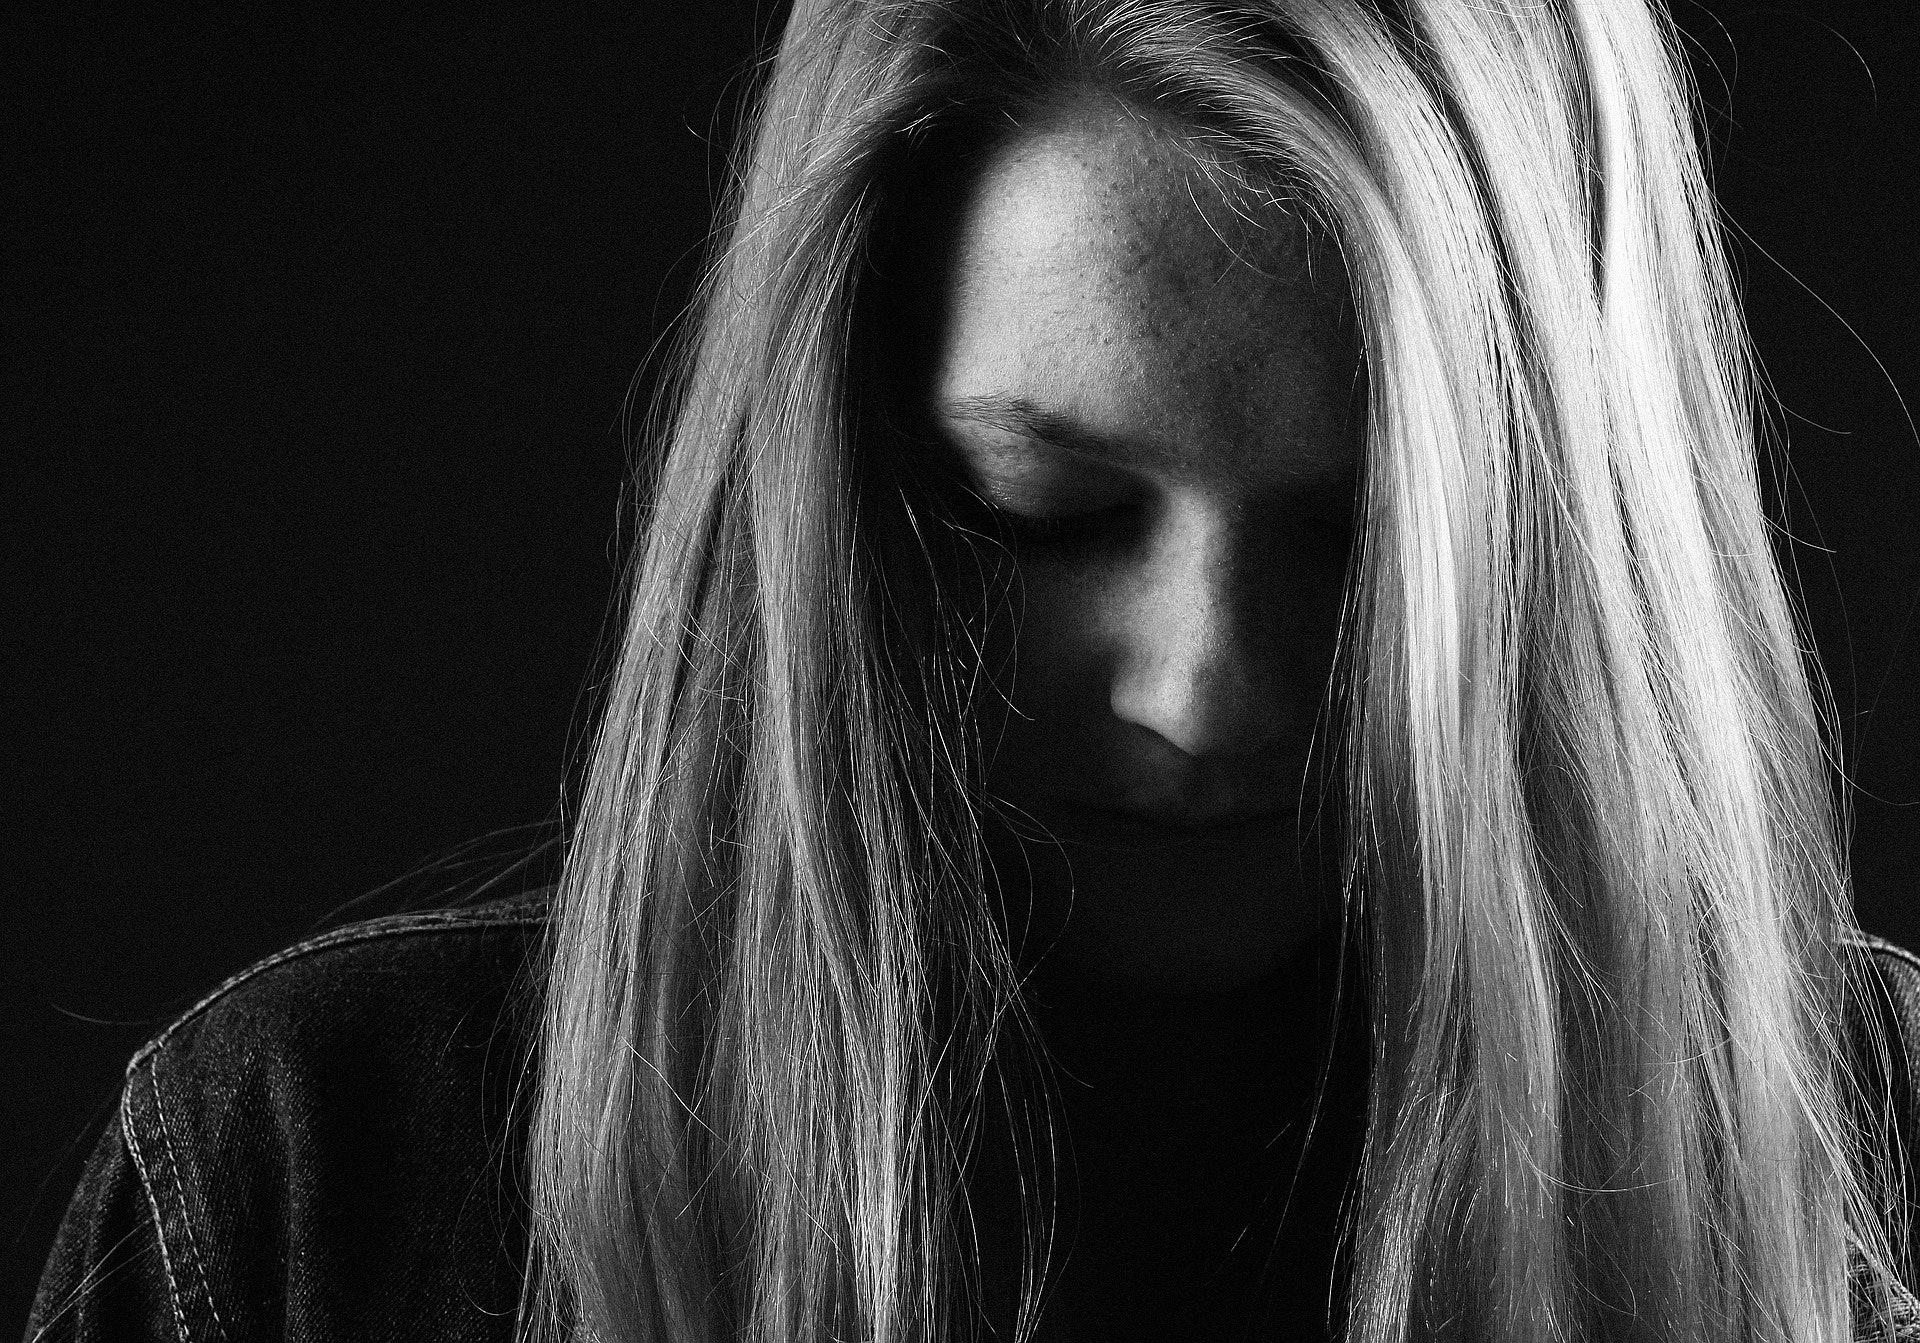 emotional woman relationship